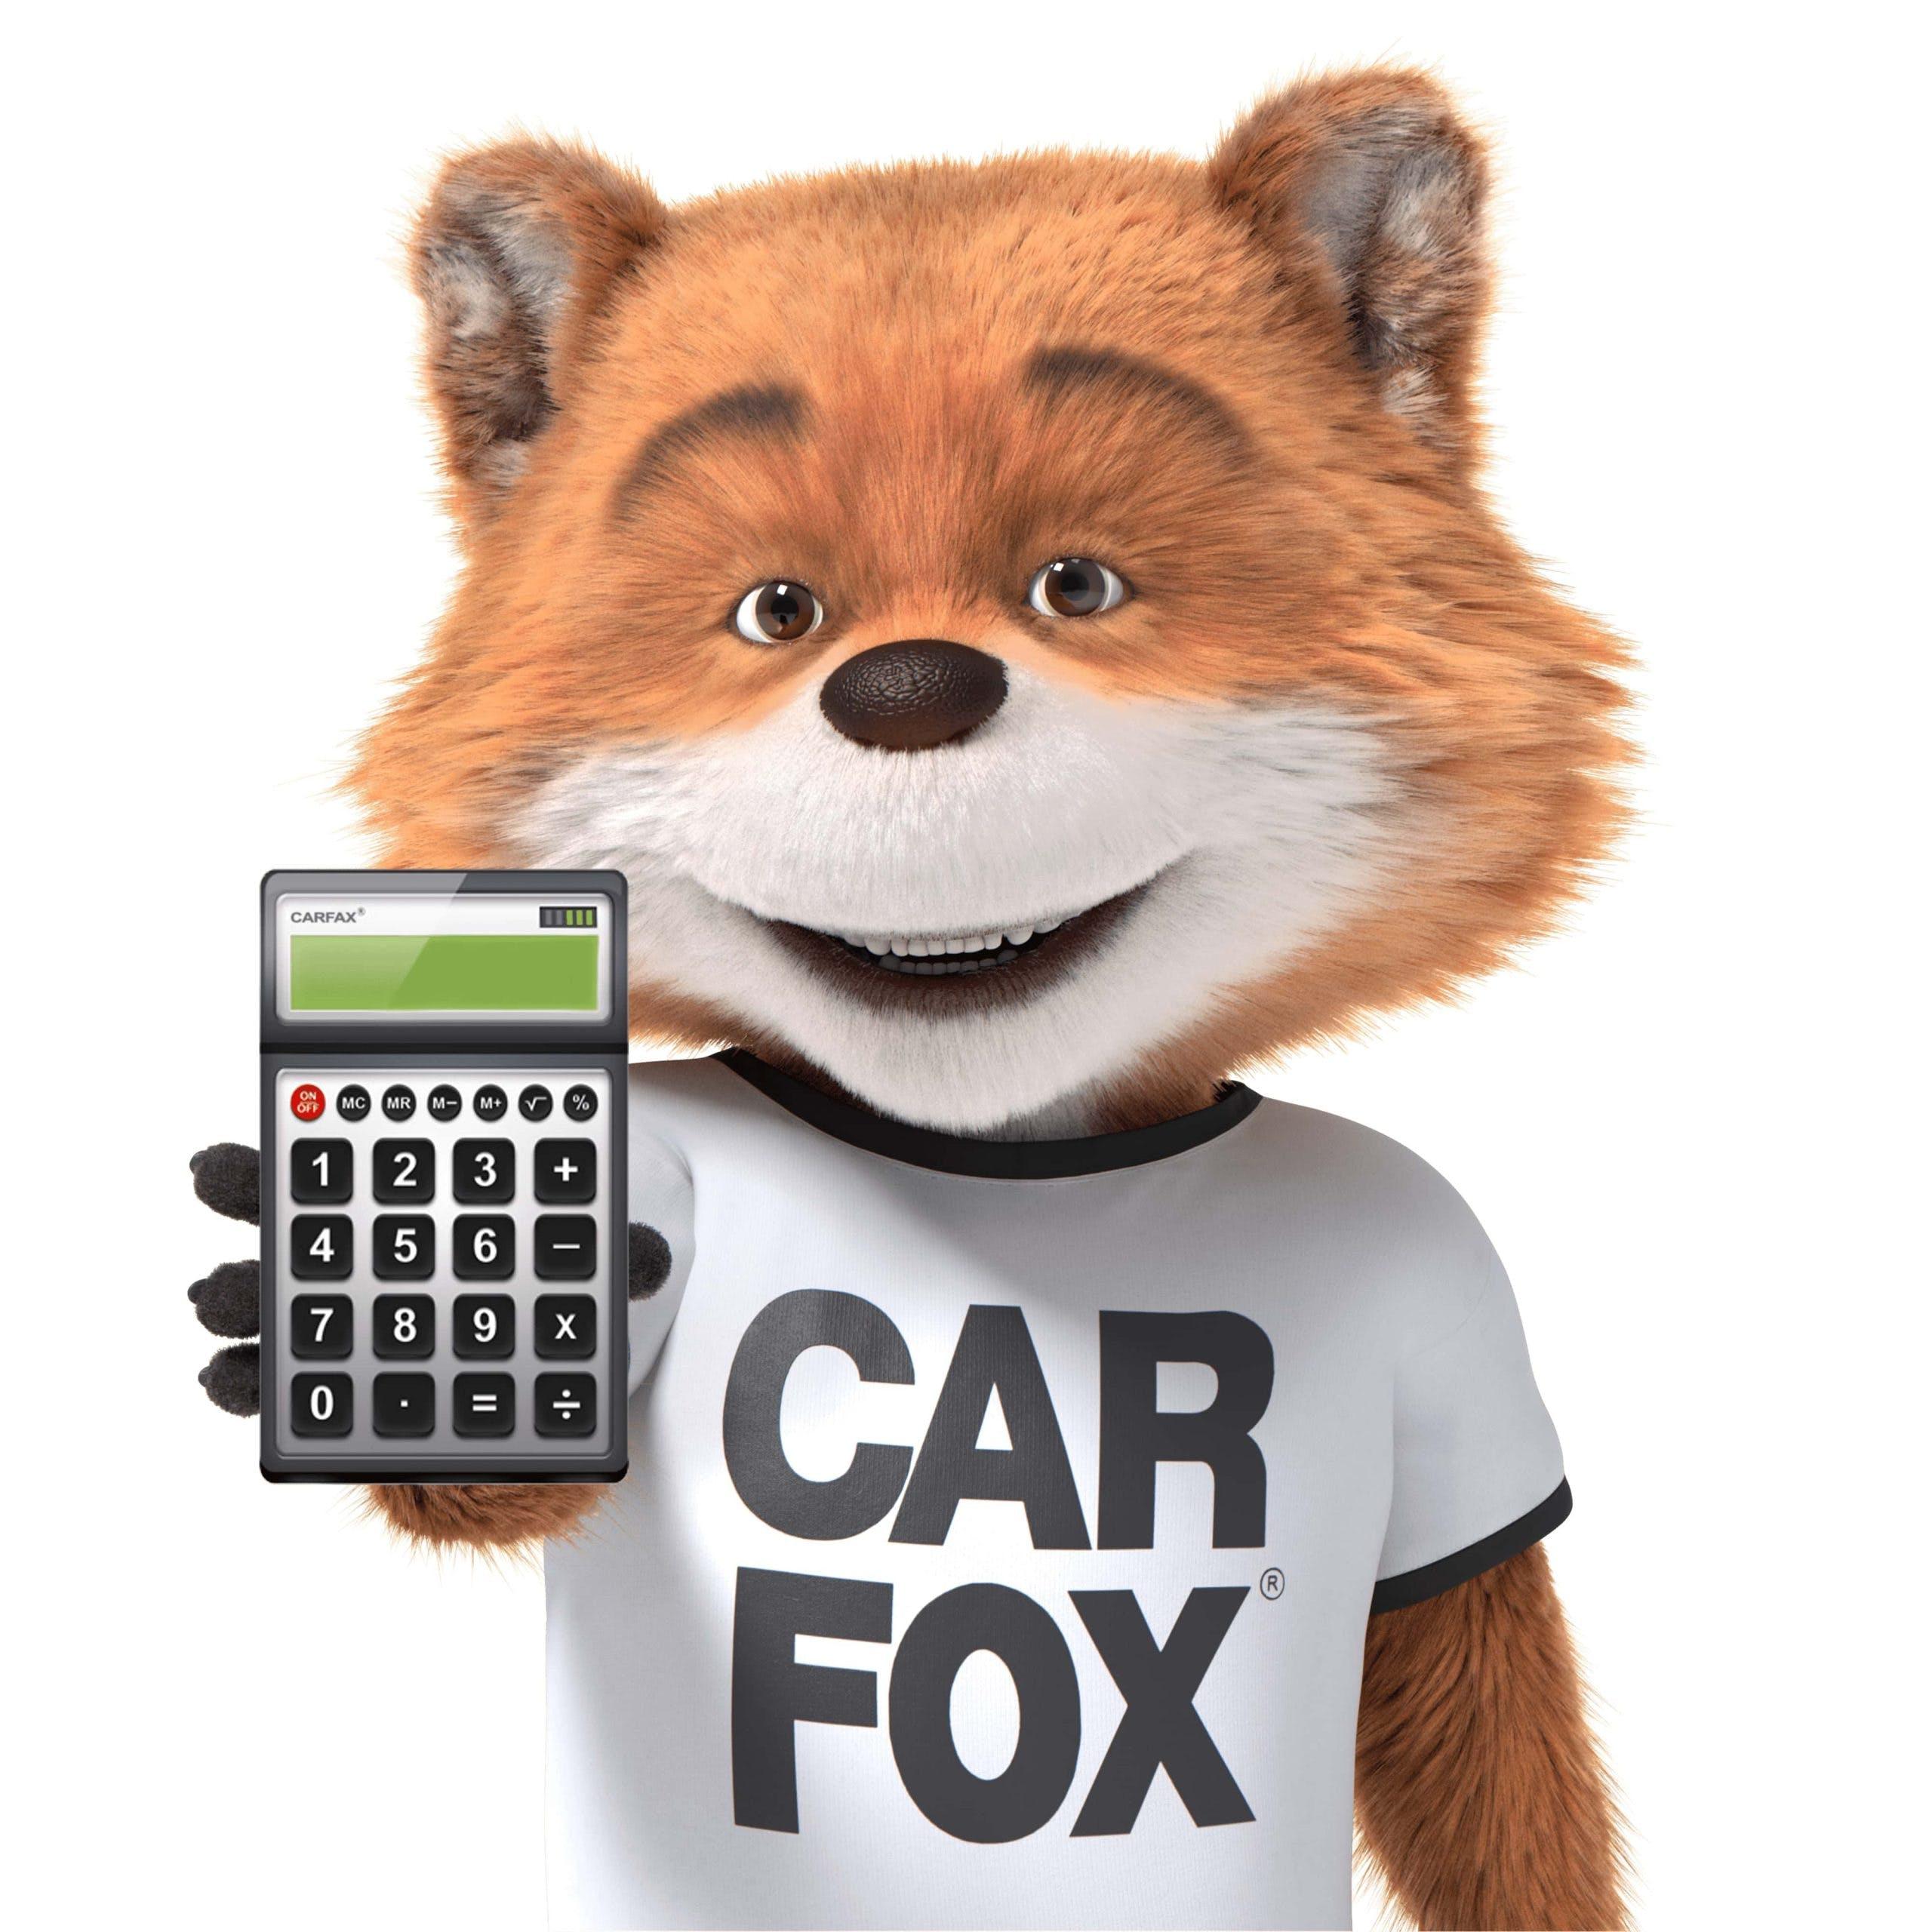 Carfax Car Fox With Calculator